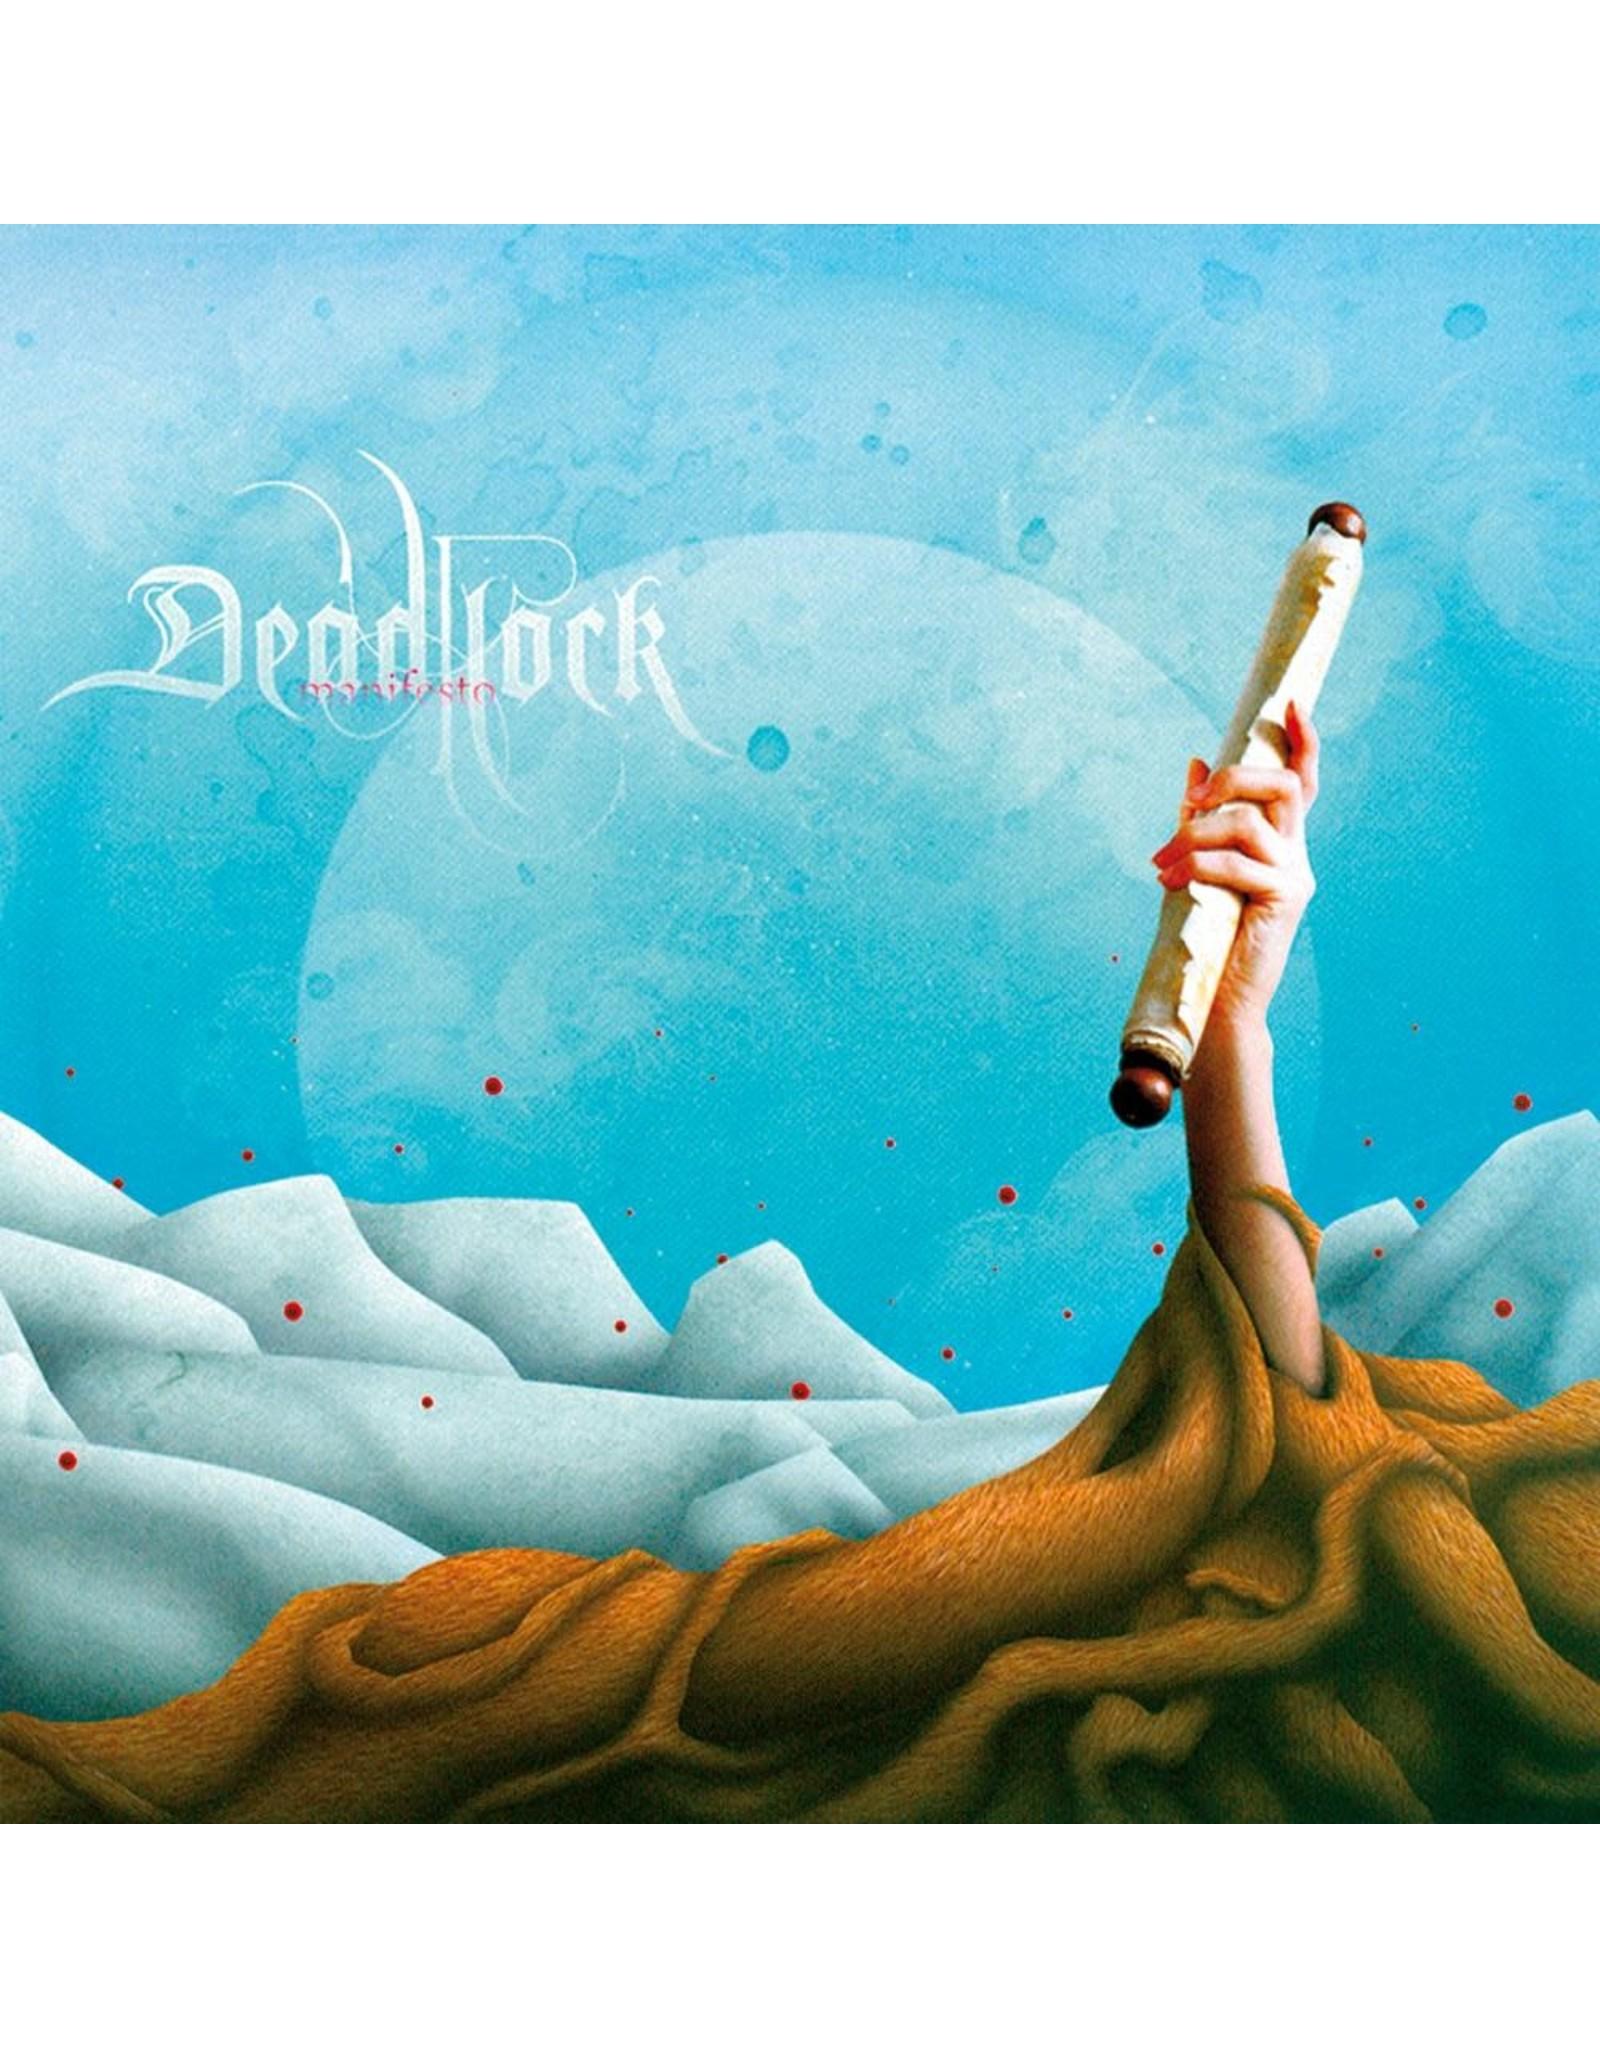 Deadlock - Manifesto (Ltd.) CD